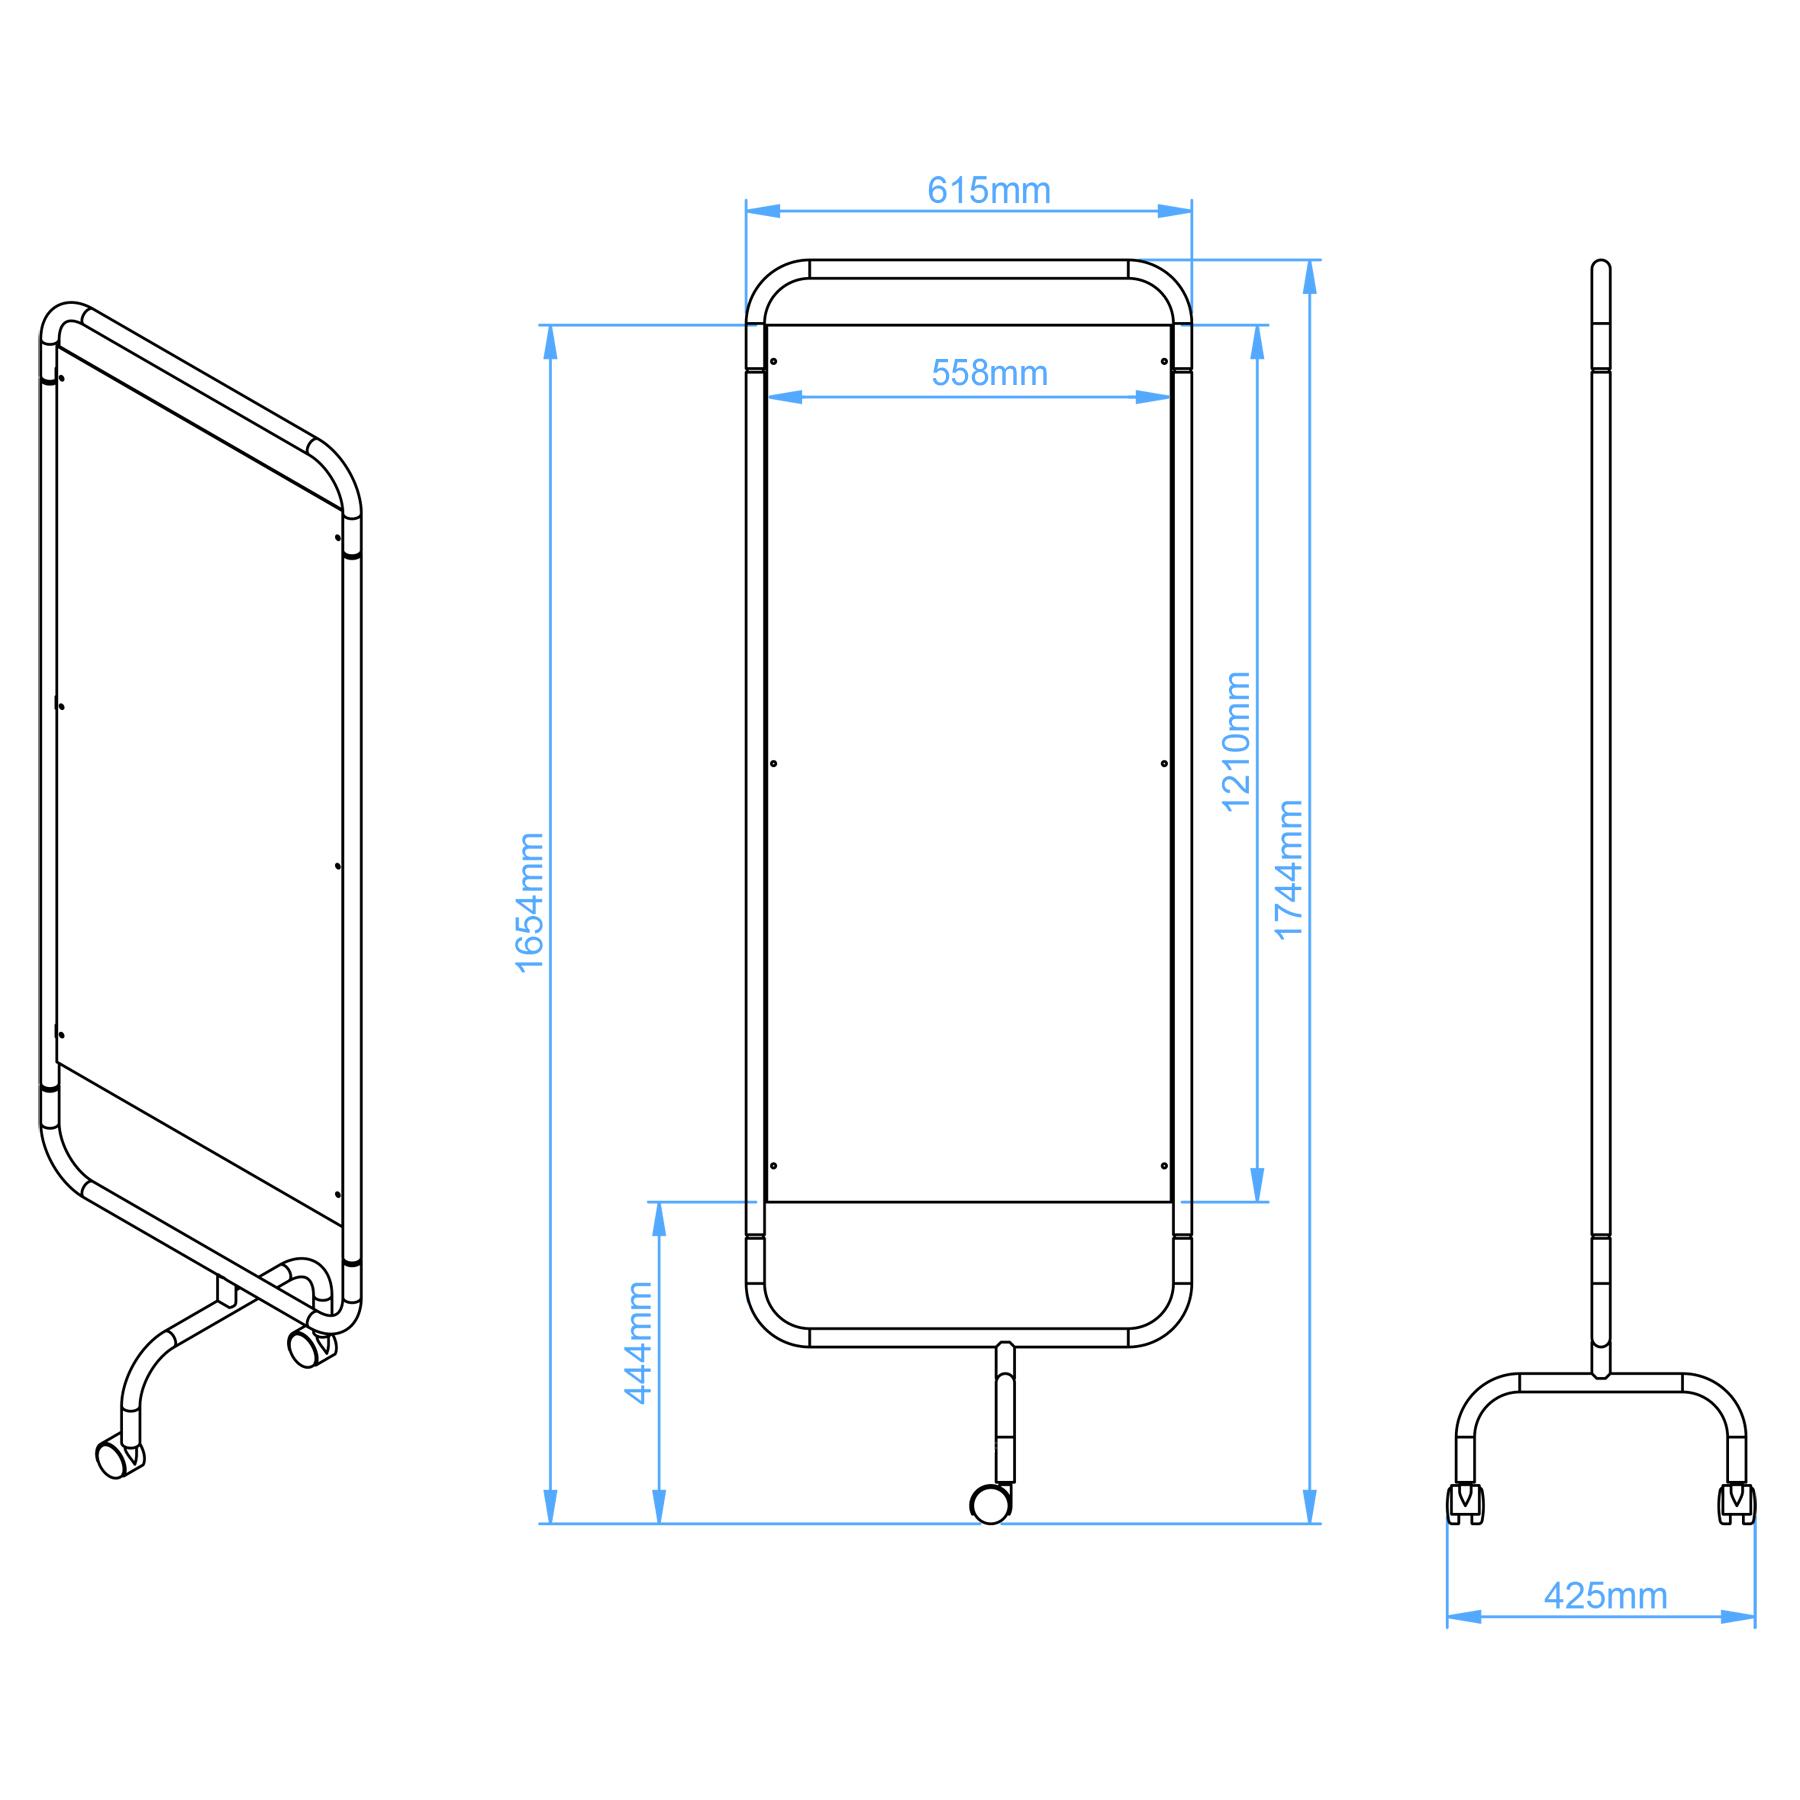 Ward Screen Dimensions